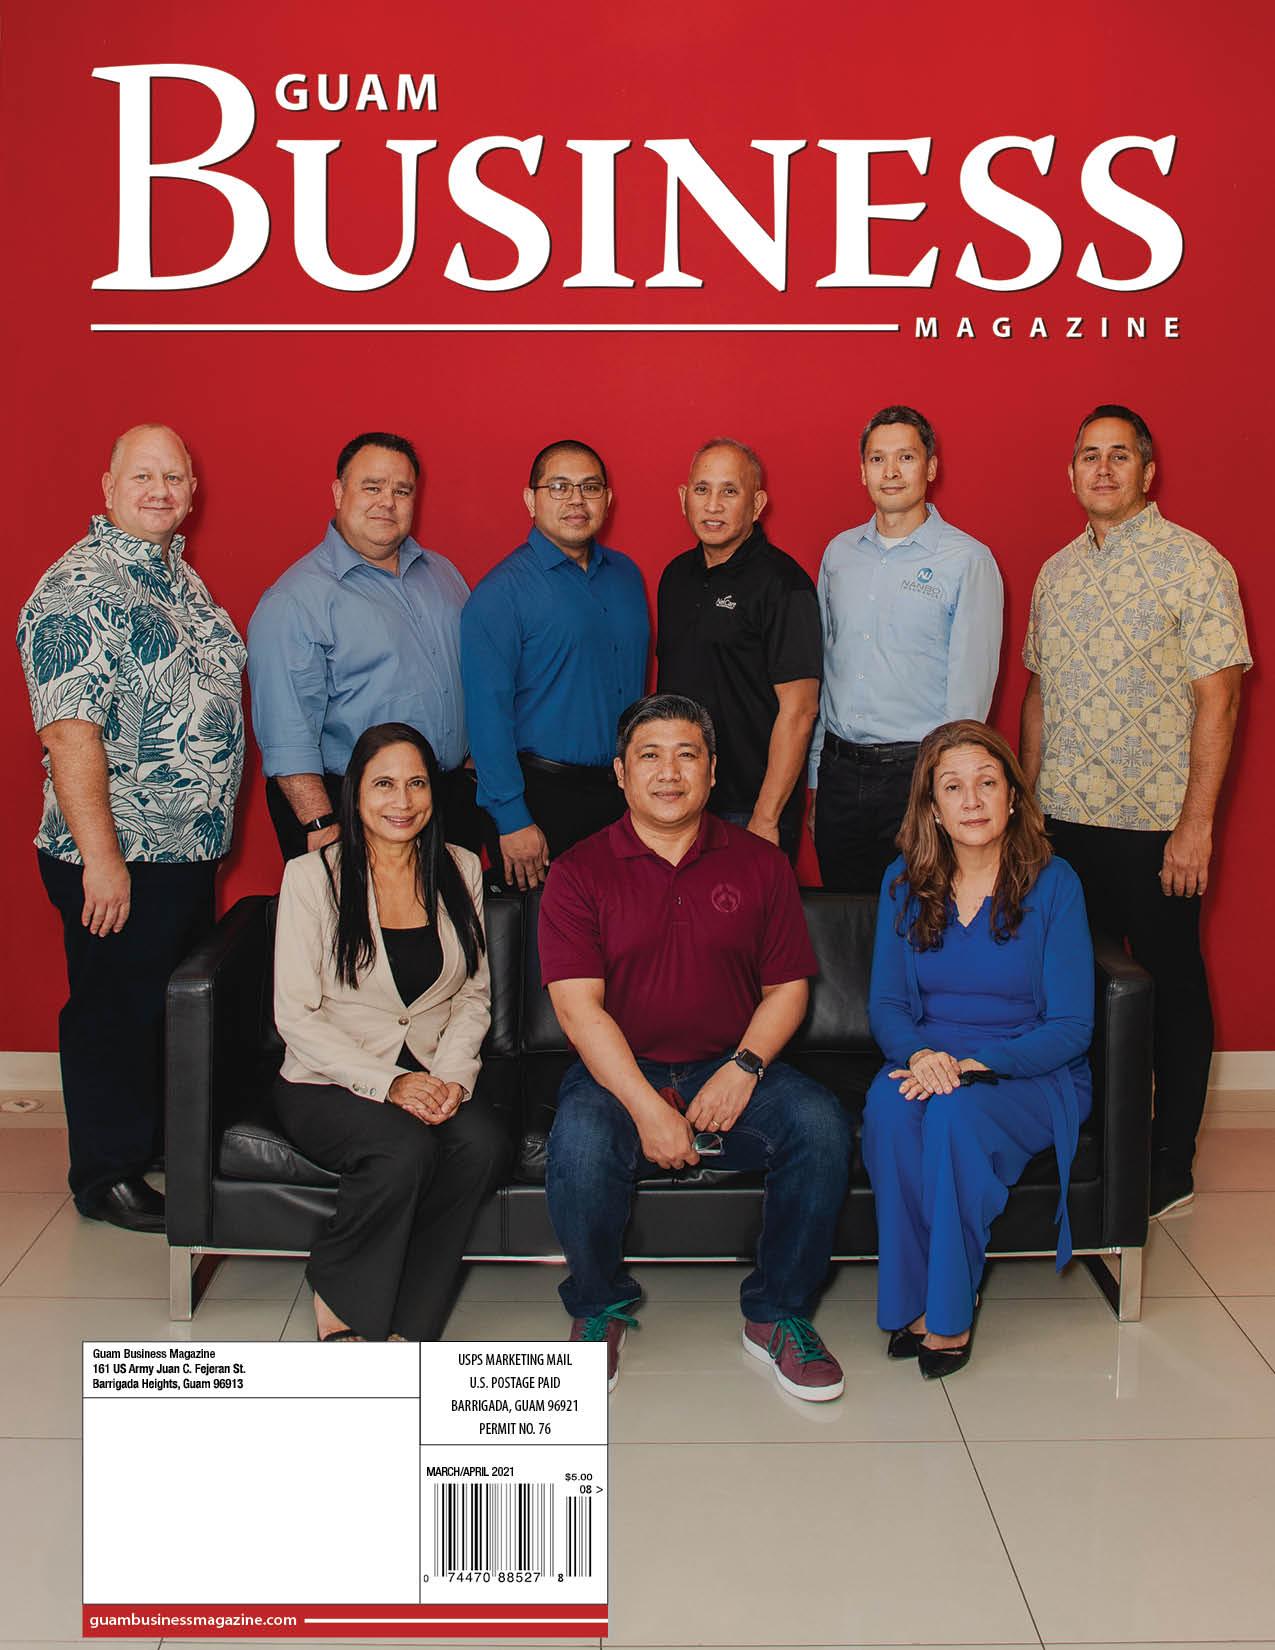 Guam Business